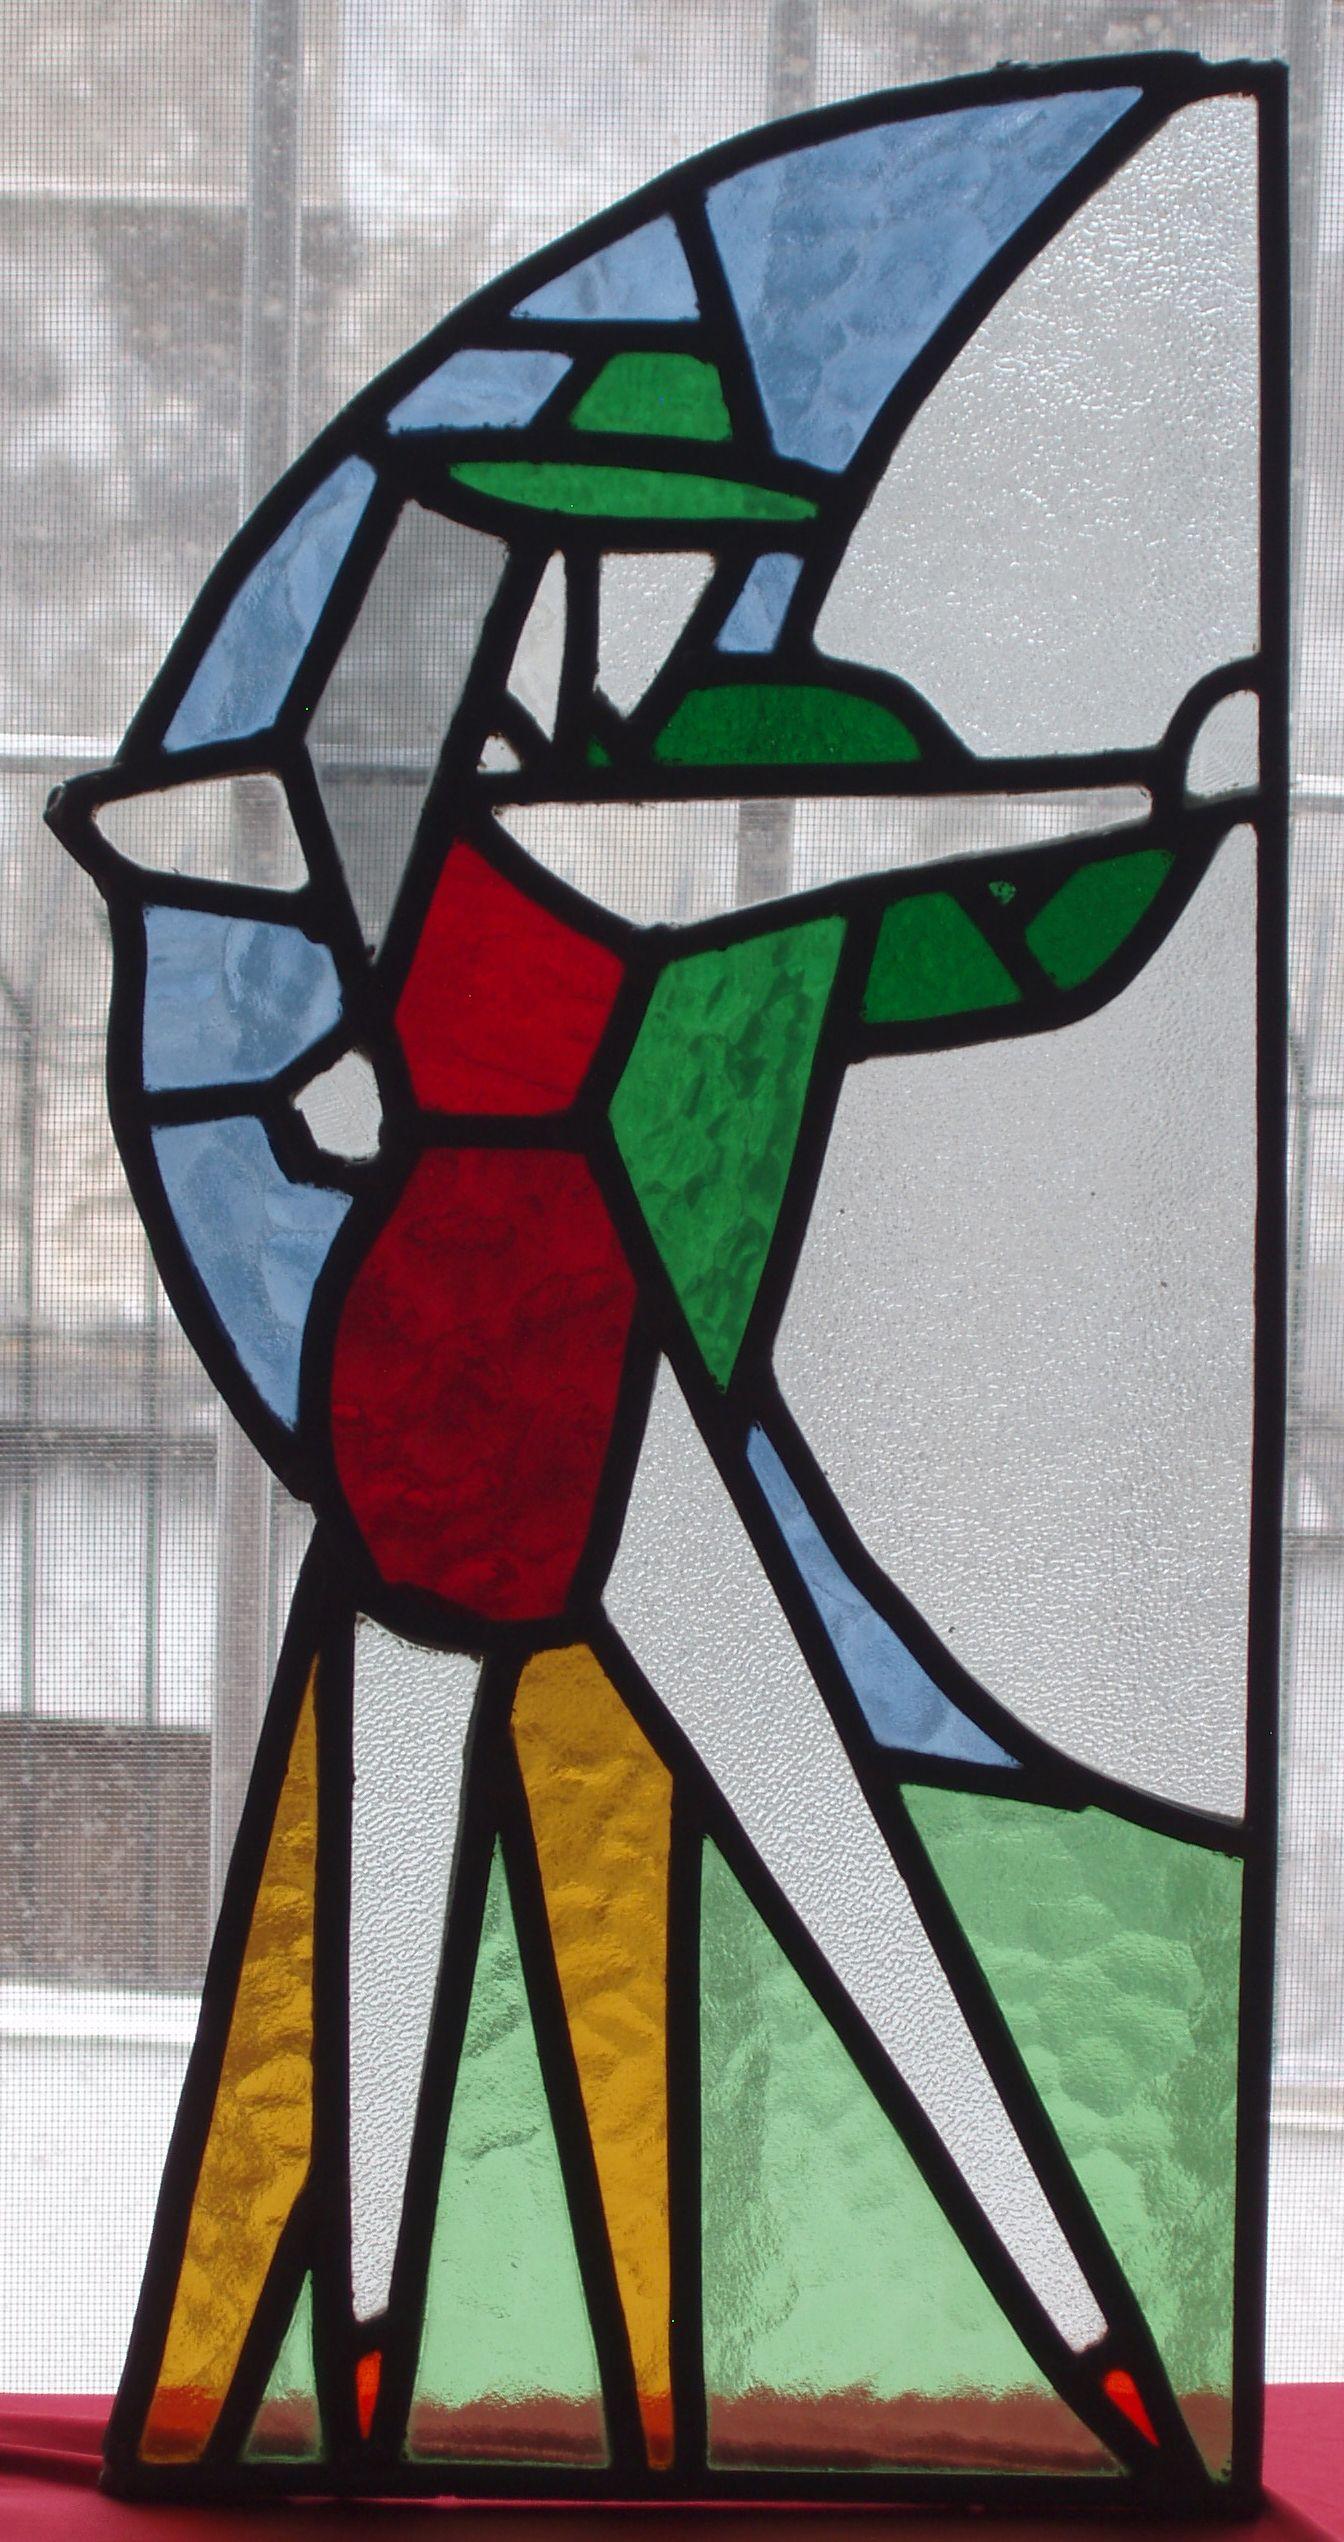 vitral emplomado con vidrios de colores